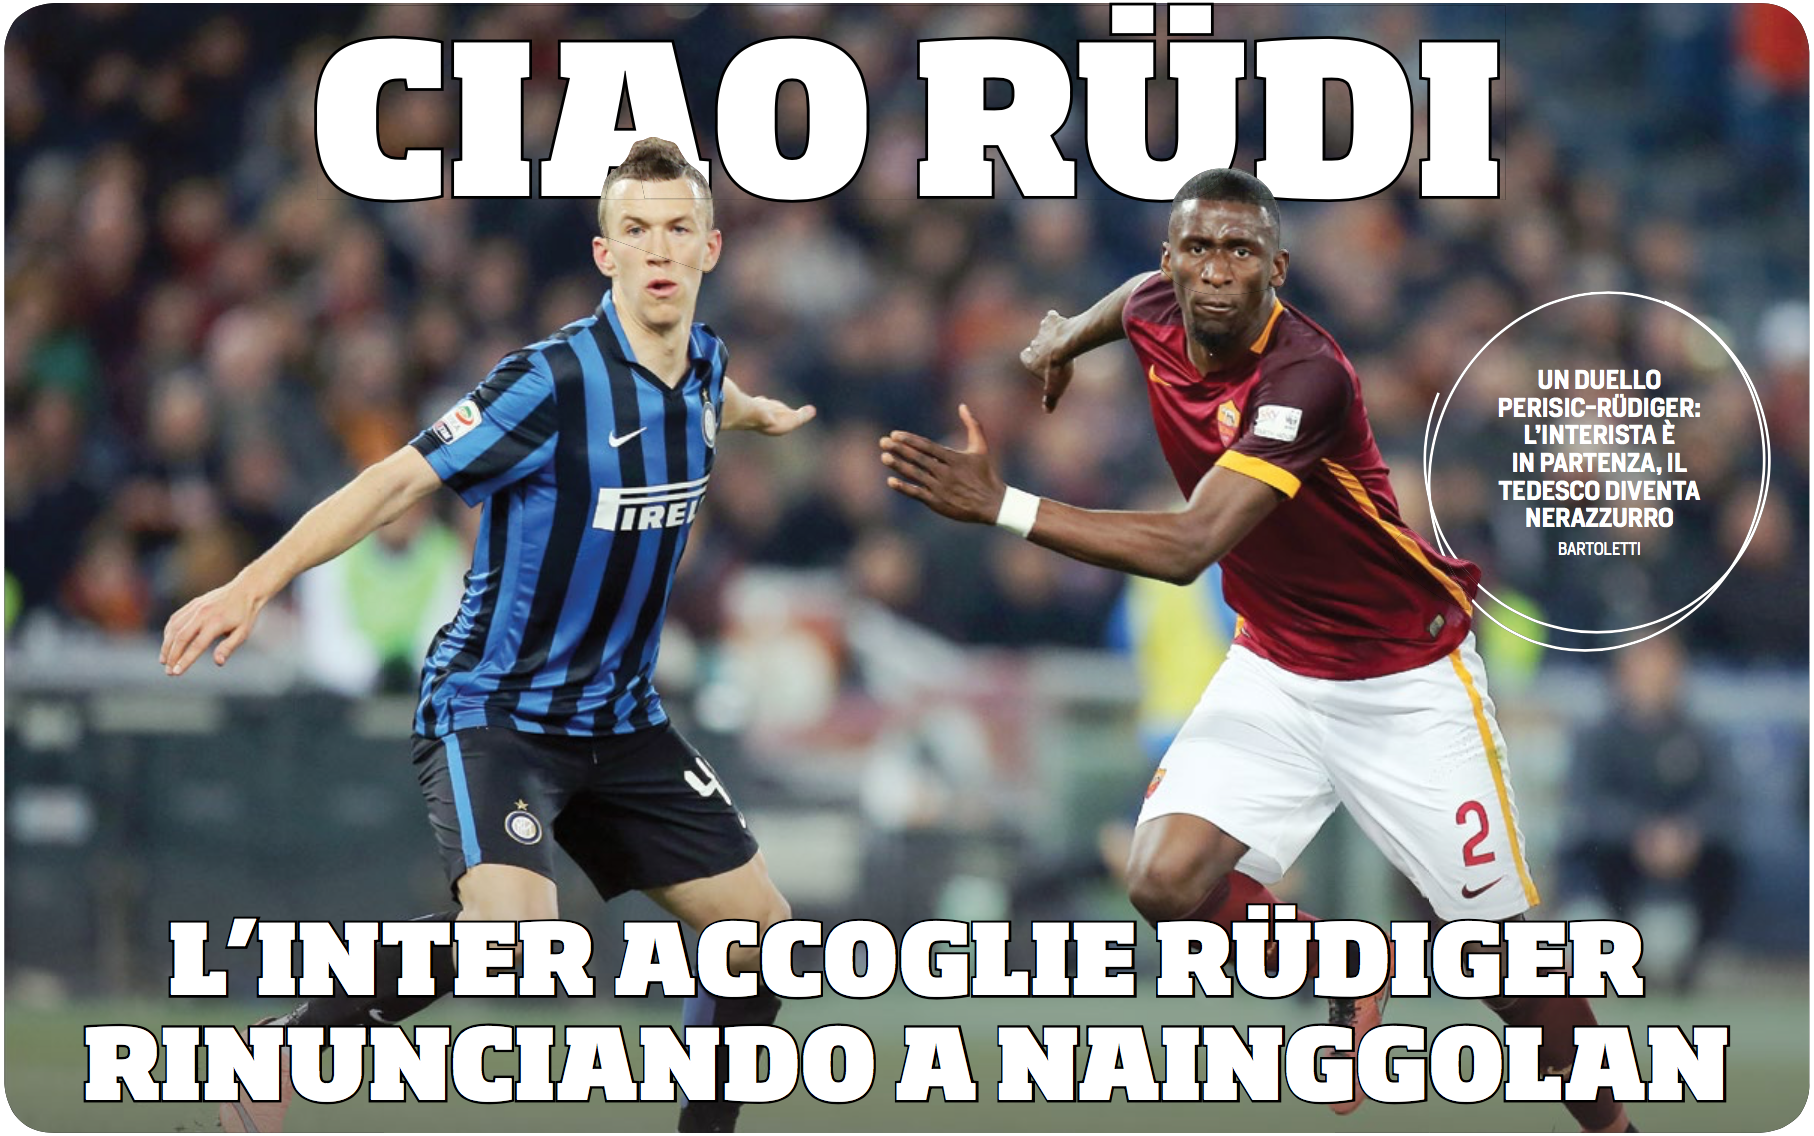 BYE RUDI - INTER WELCOME RUDIGER, GIVE UP ON NAINGGOLAN